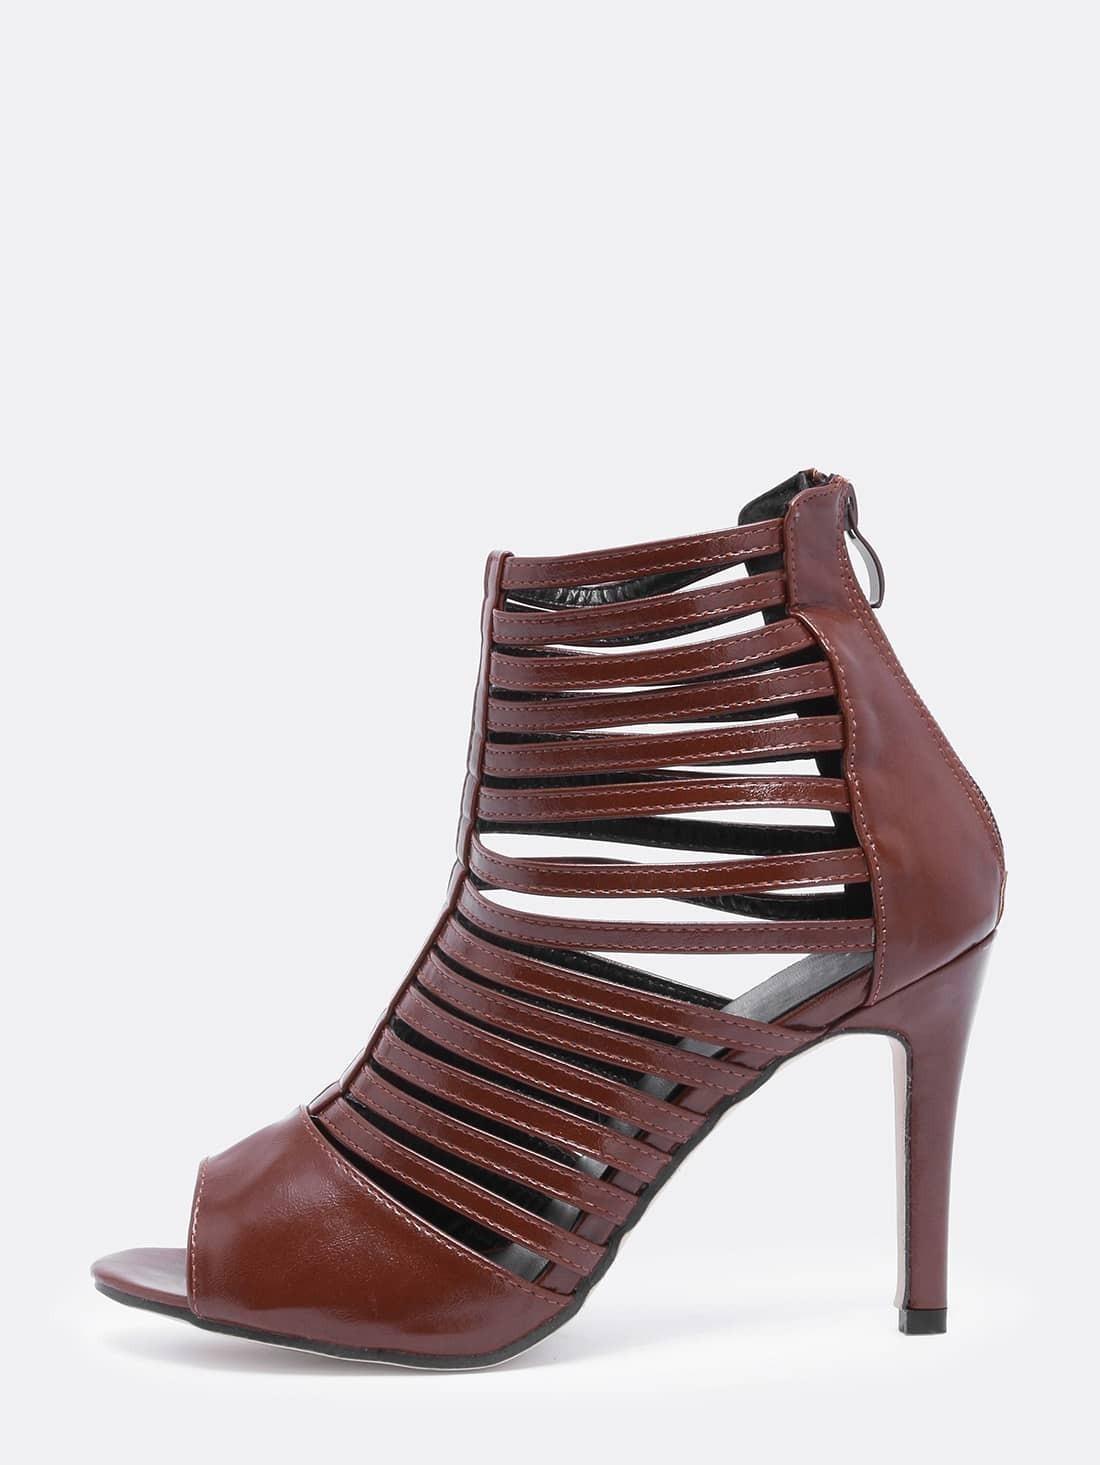 Coffee Peep Toe High Stiletto Heel Caged Shoes